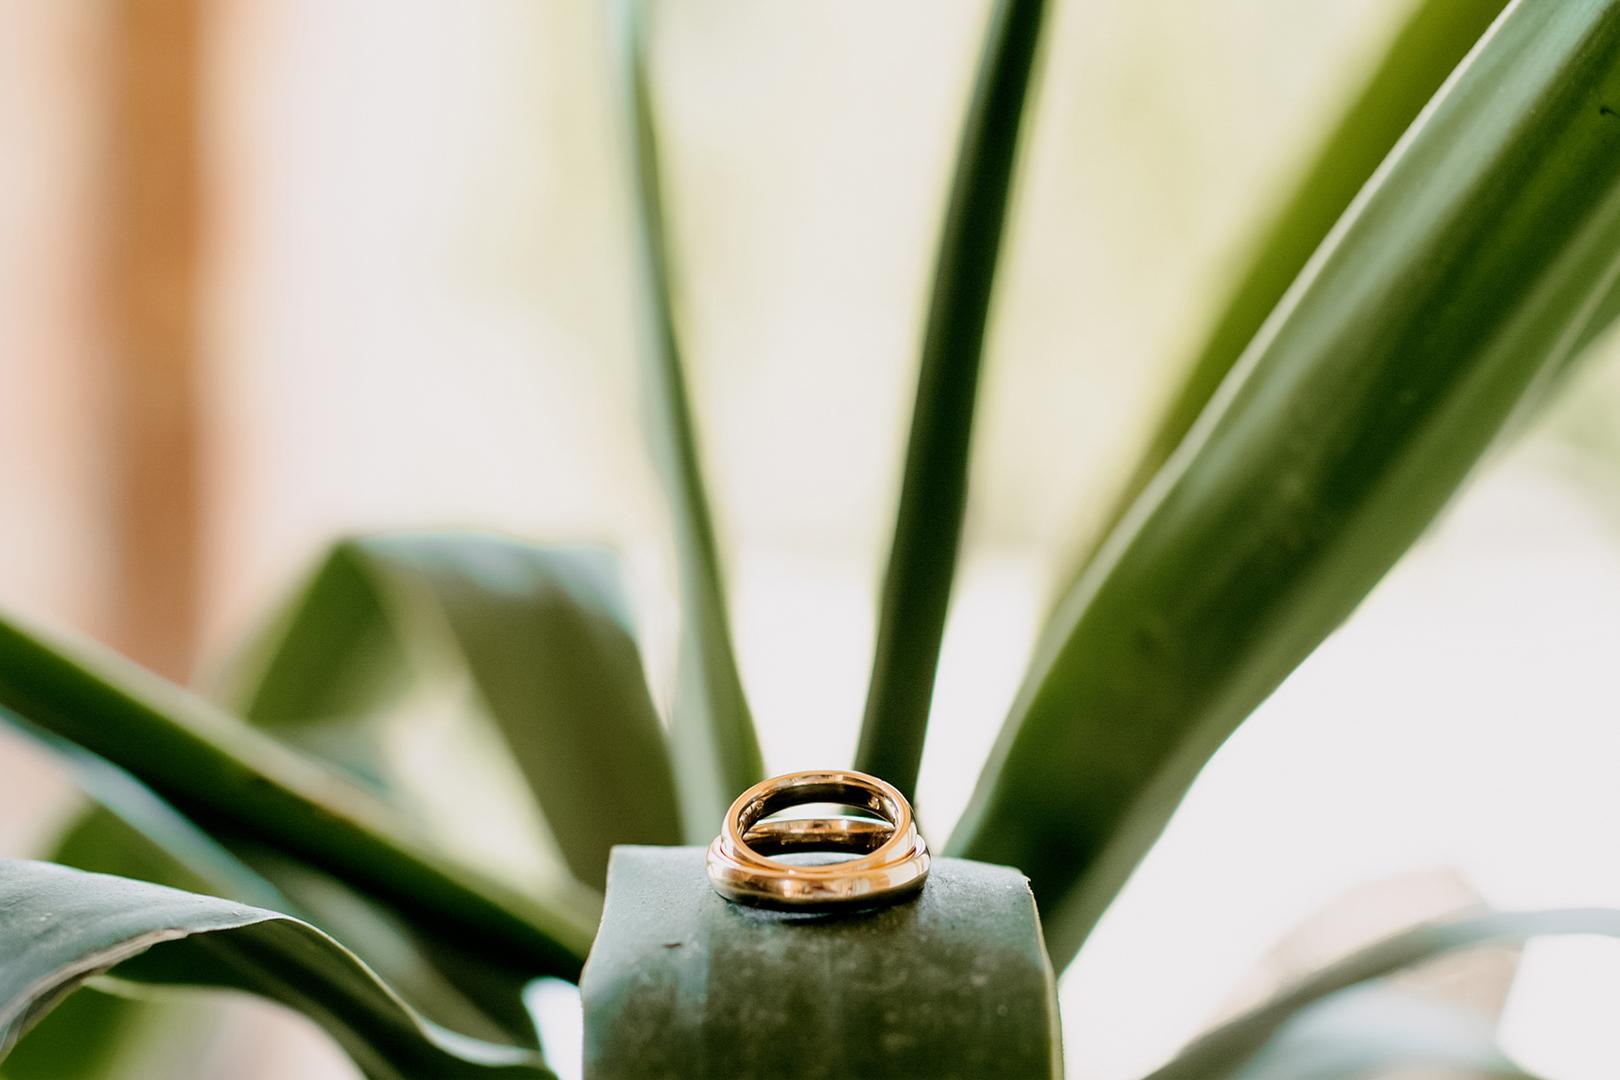 5 gianni-lepopre-fotografo-fedi-sposi-dettagli-ring